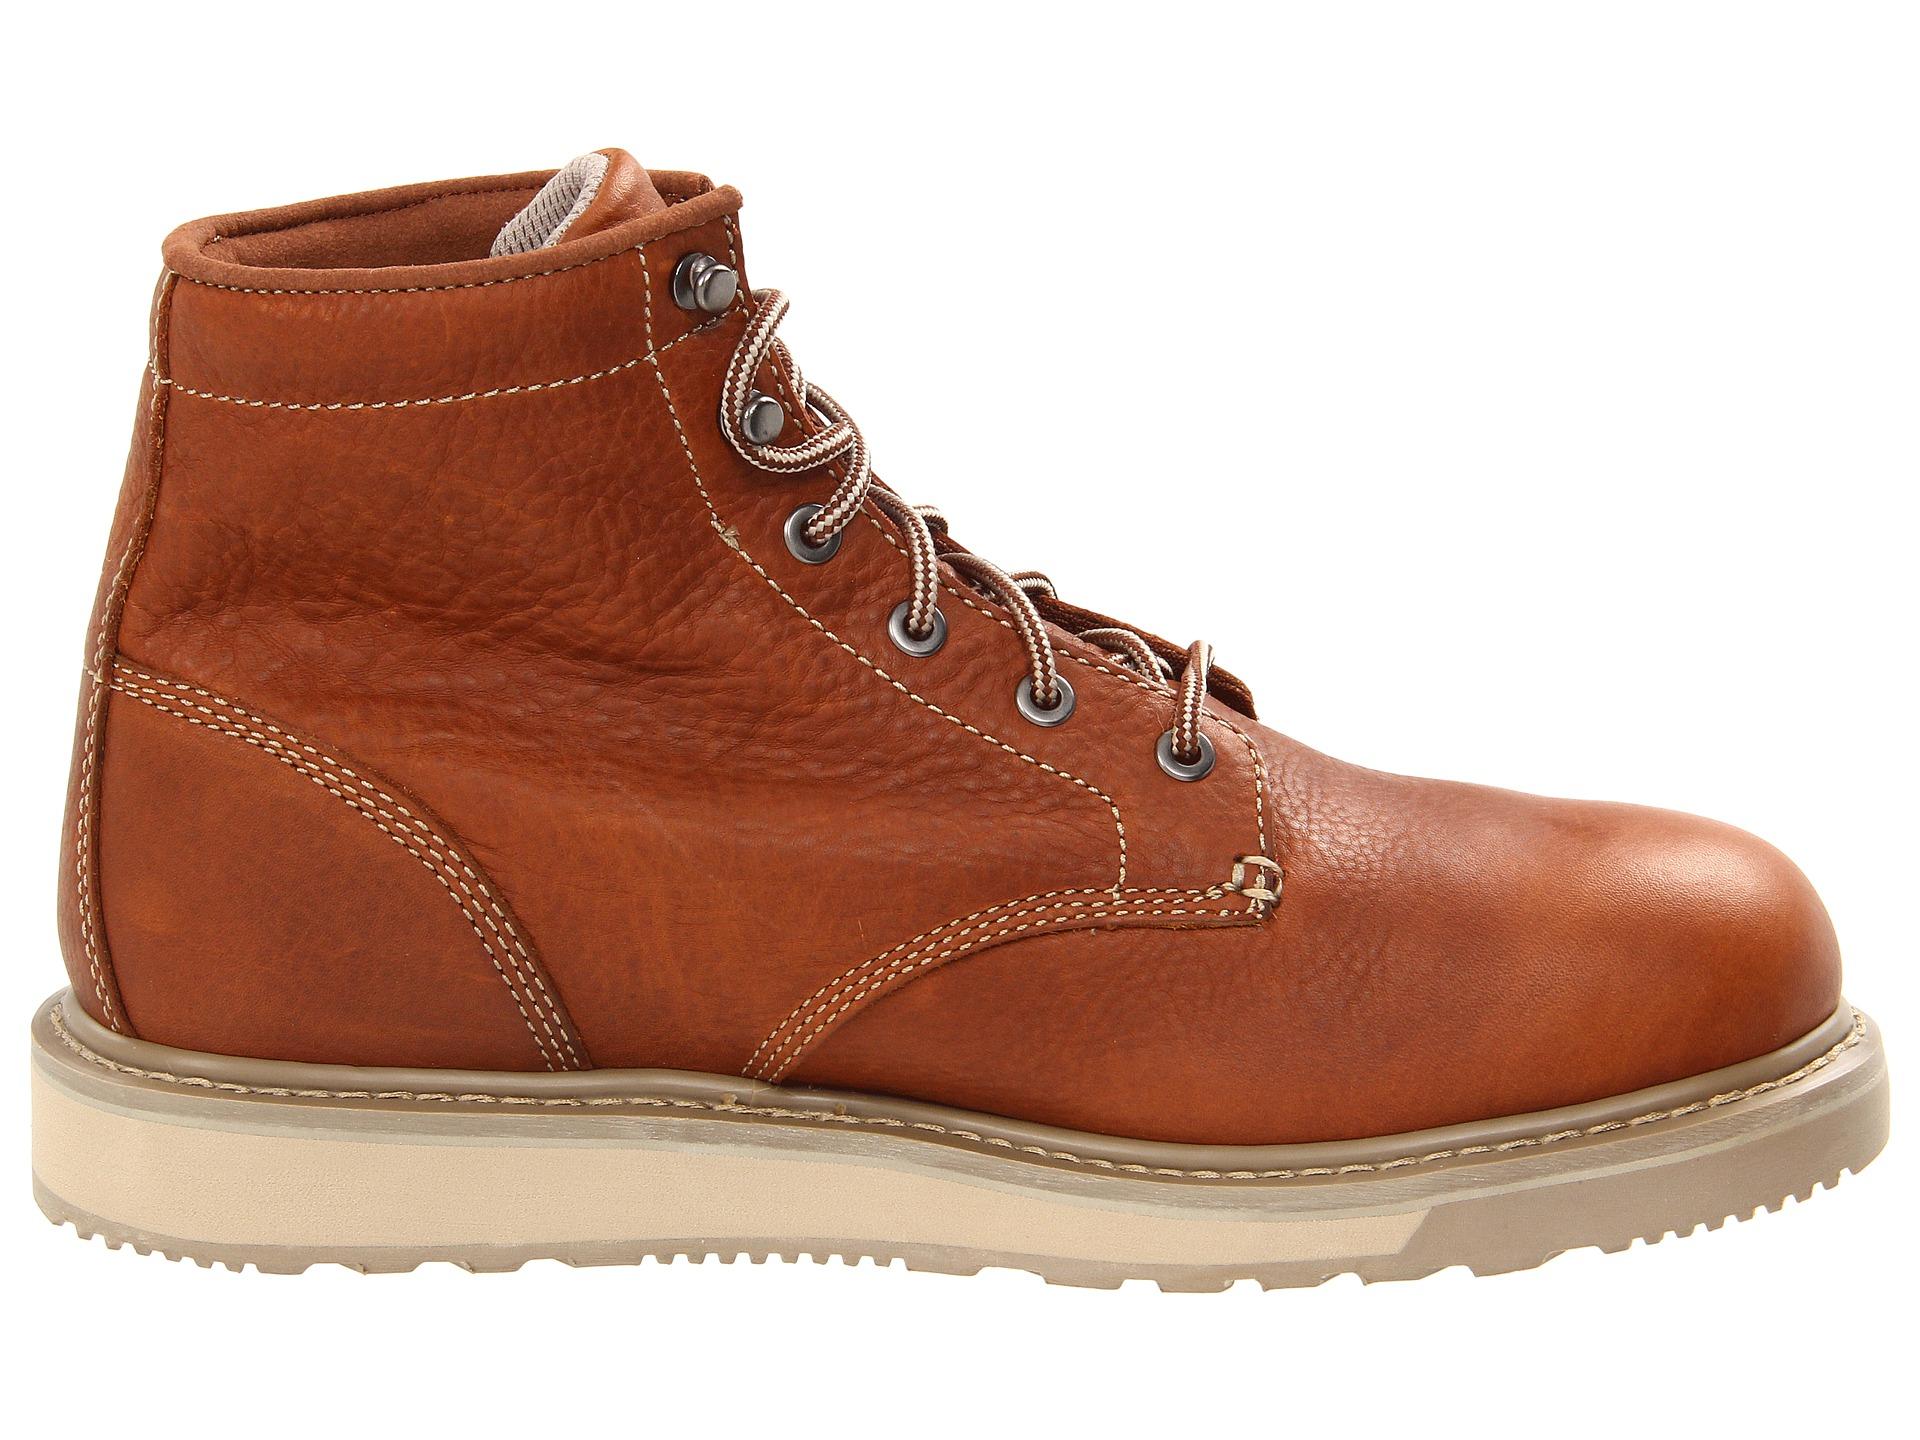 timberland pro barstow wedge plain soft toe rust shipped